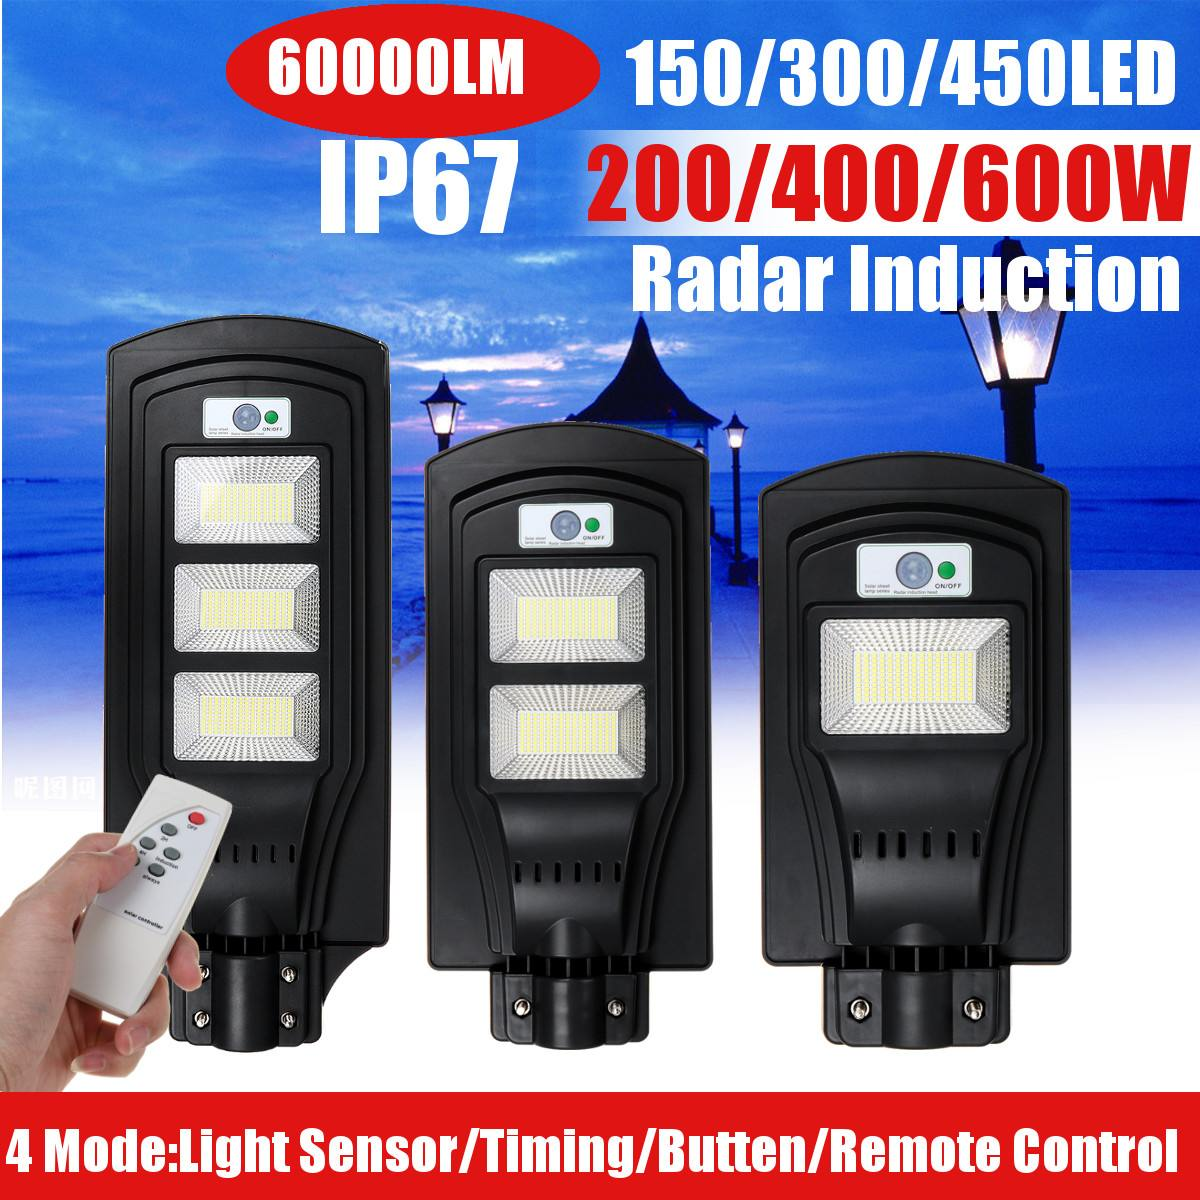 200W 400W 600W LED Outdoor Solar Street Light Solar Powered IP67 Wall Lamp Radar Motion Remote Light Control For Garden Yard